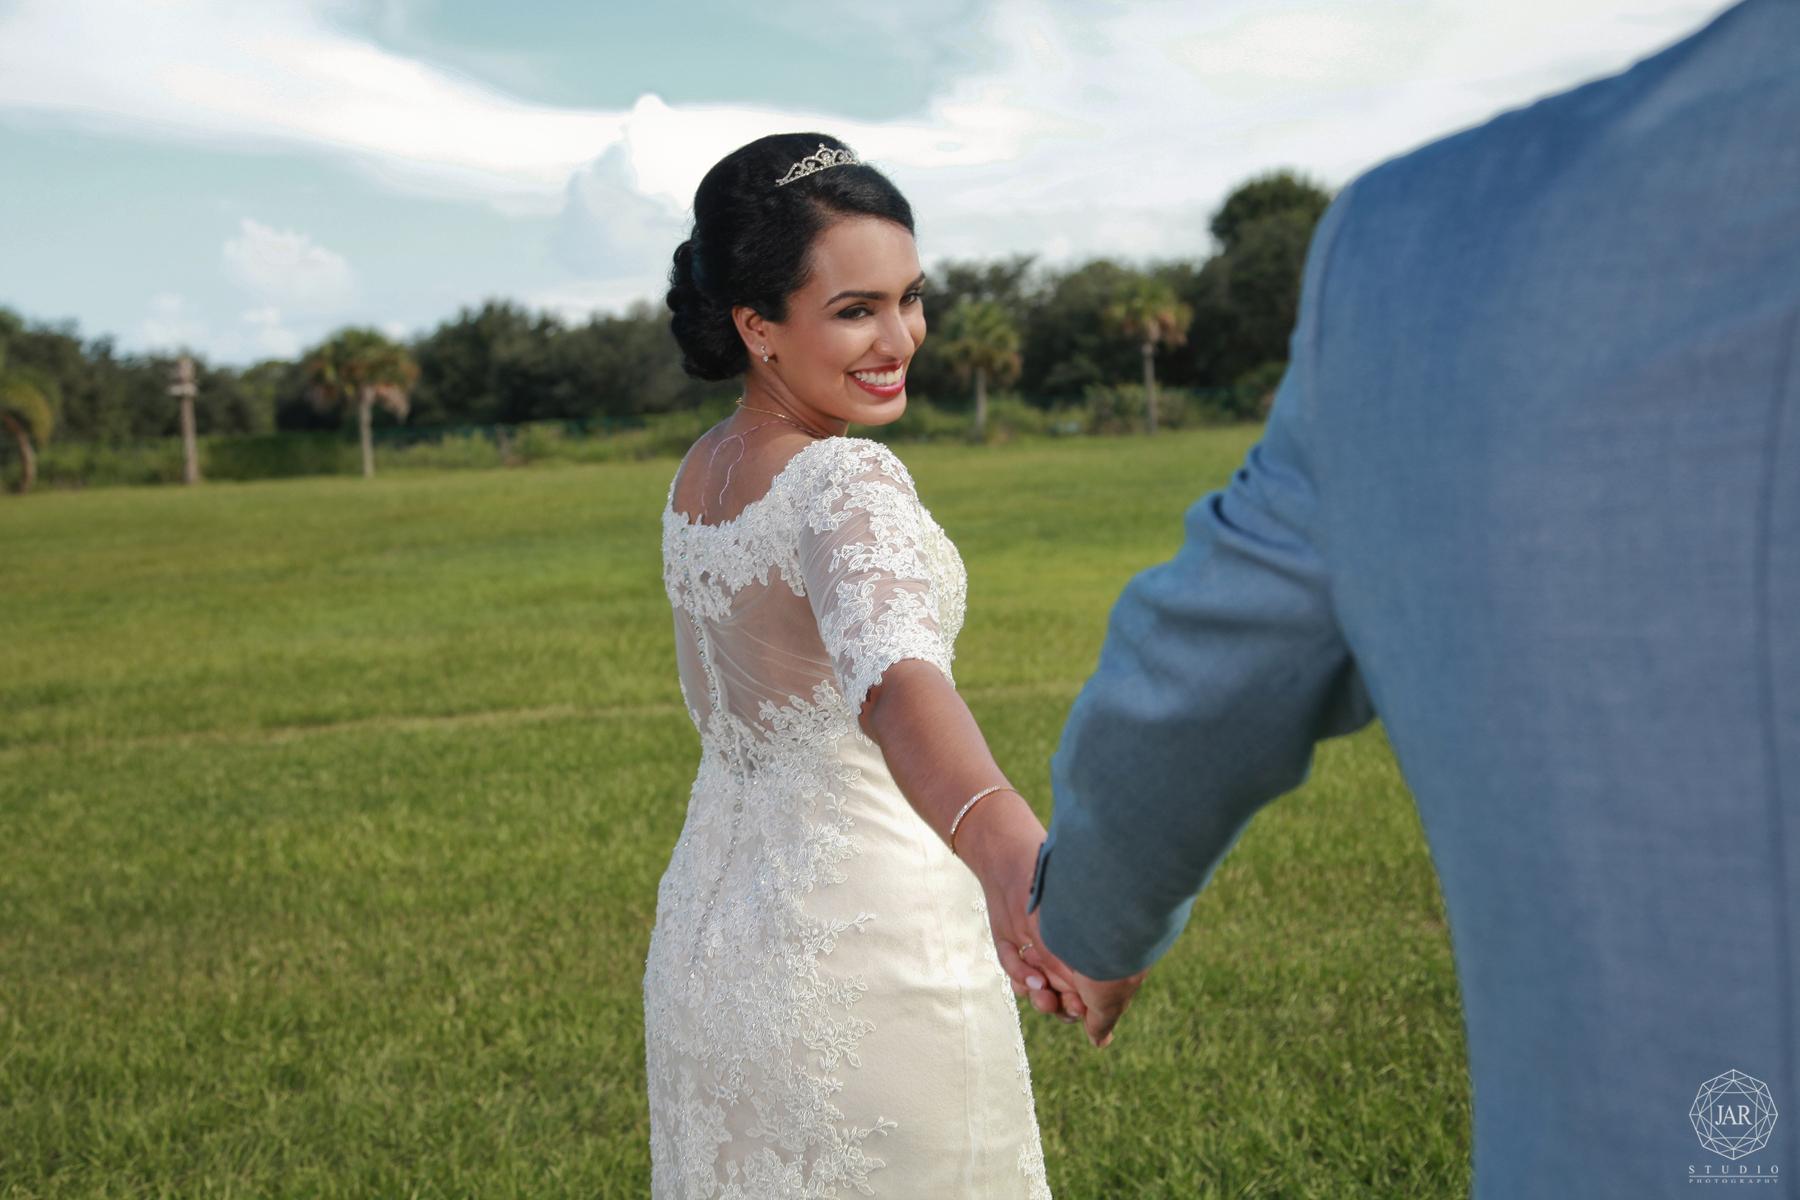 32-sunny-outdoor-gorgeous-dress-orlando-wedding-jarstudio-photography.jpg